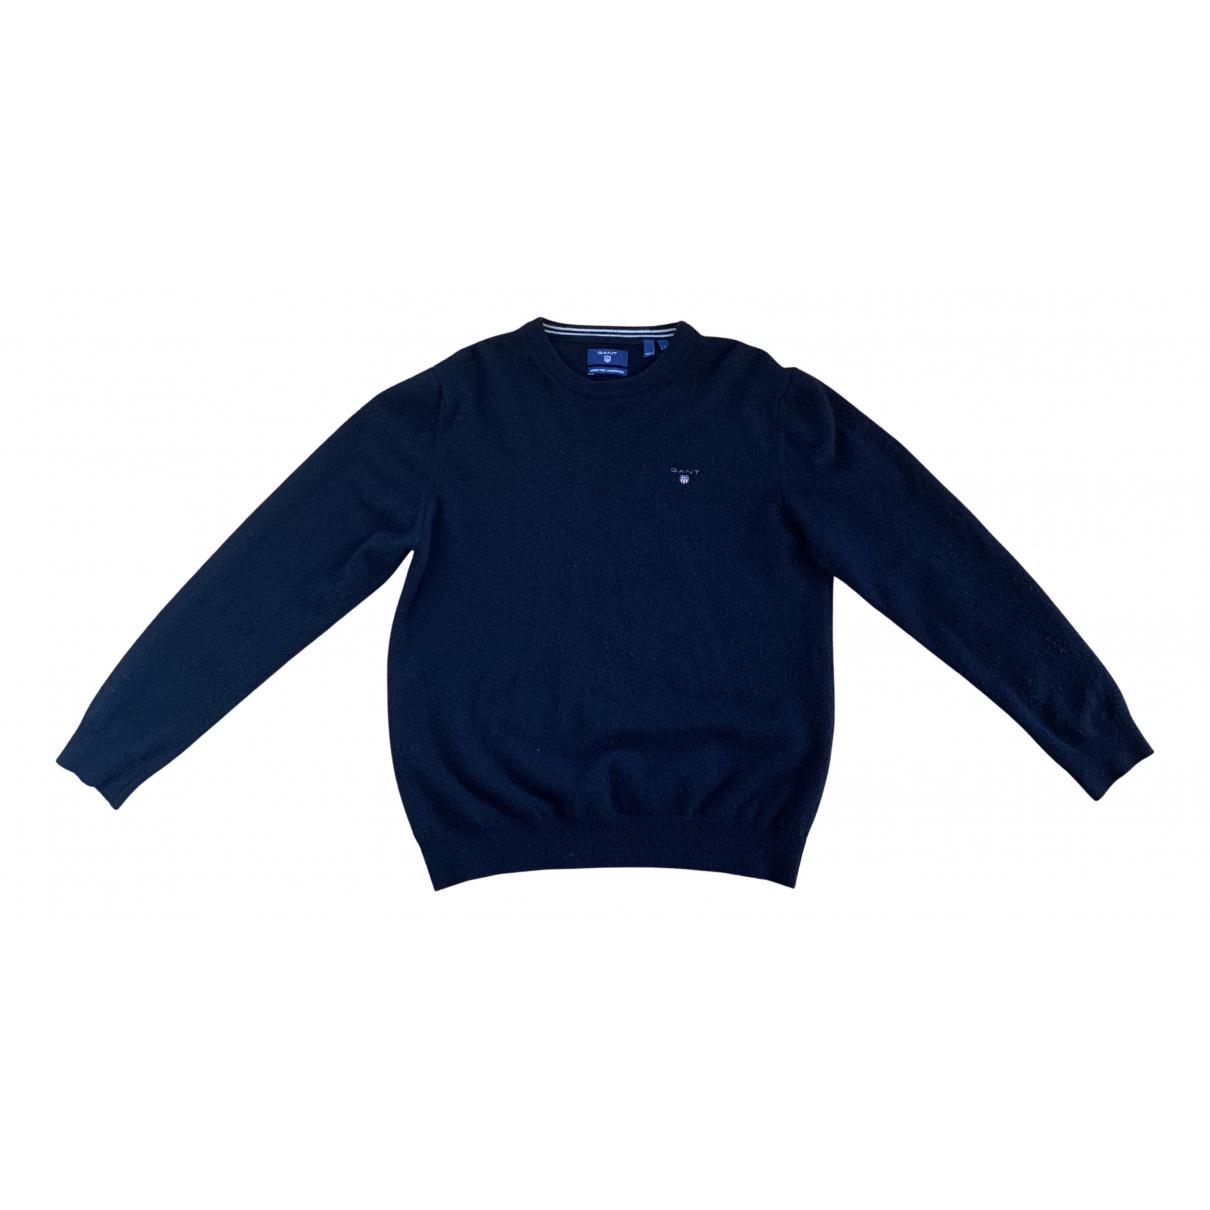 Gant N Black Cotton Knitwear & Sweatshirts for Men L International